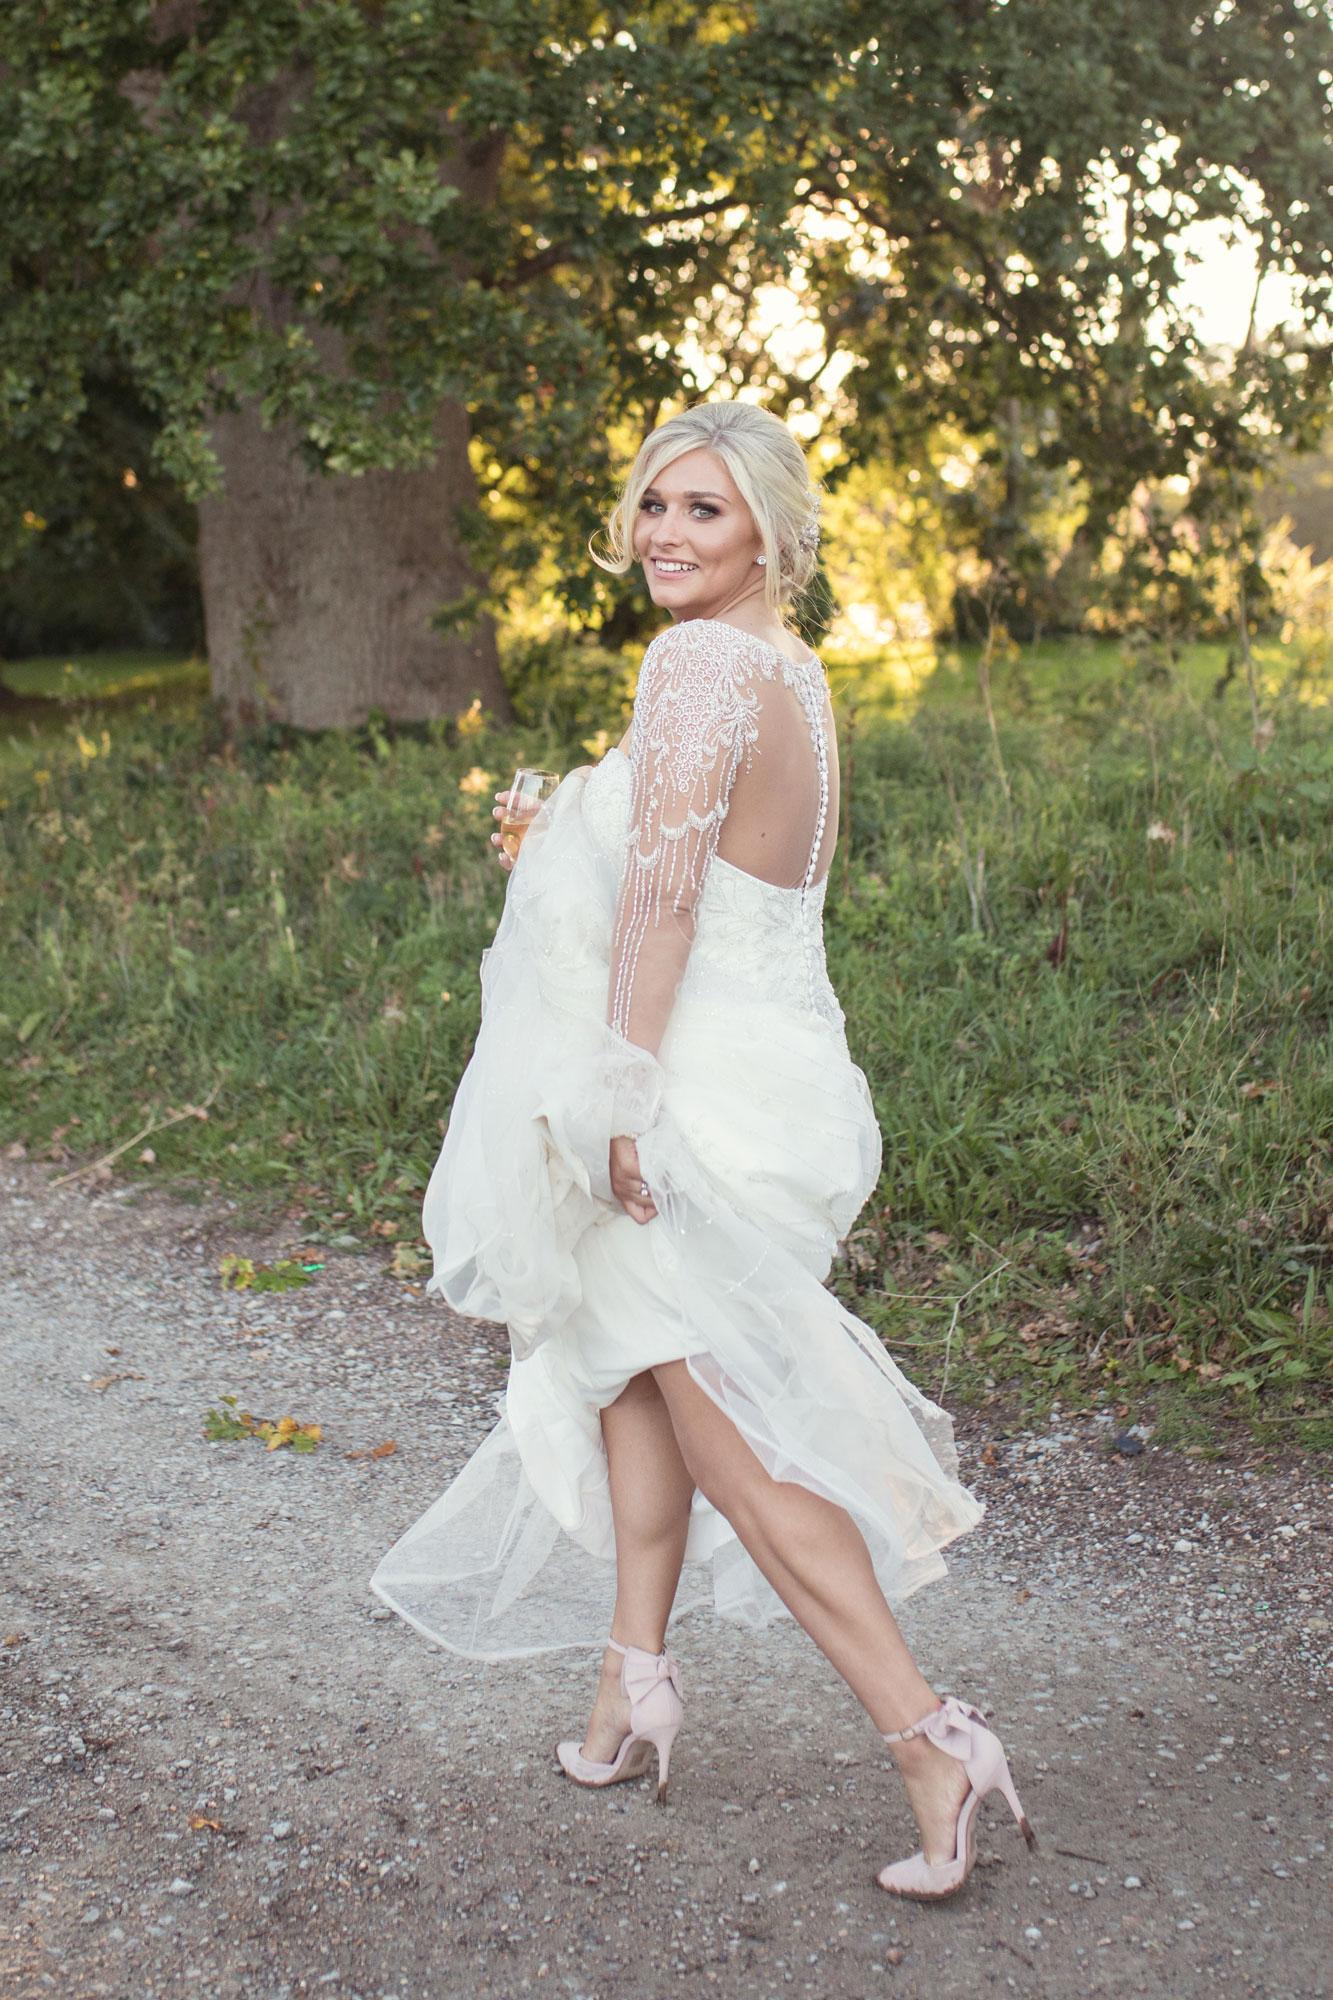 bride dress hitched natural chilston park wedding photographer